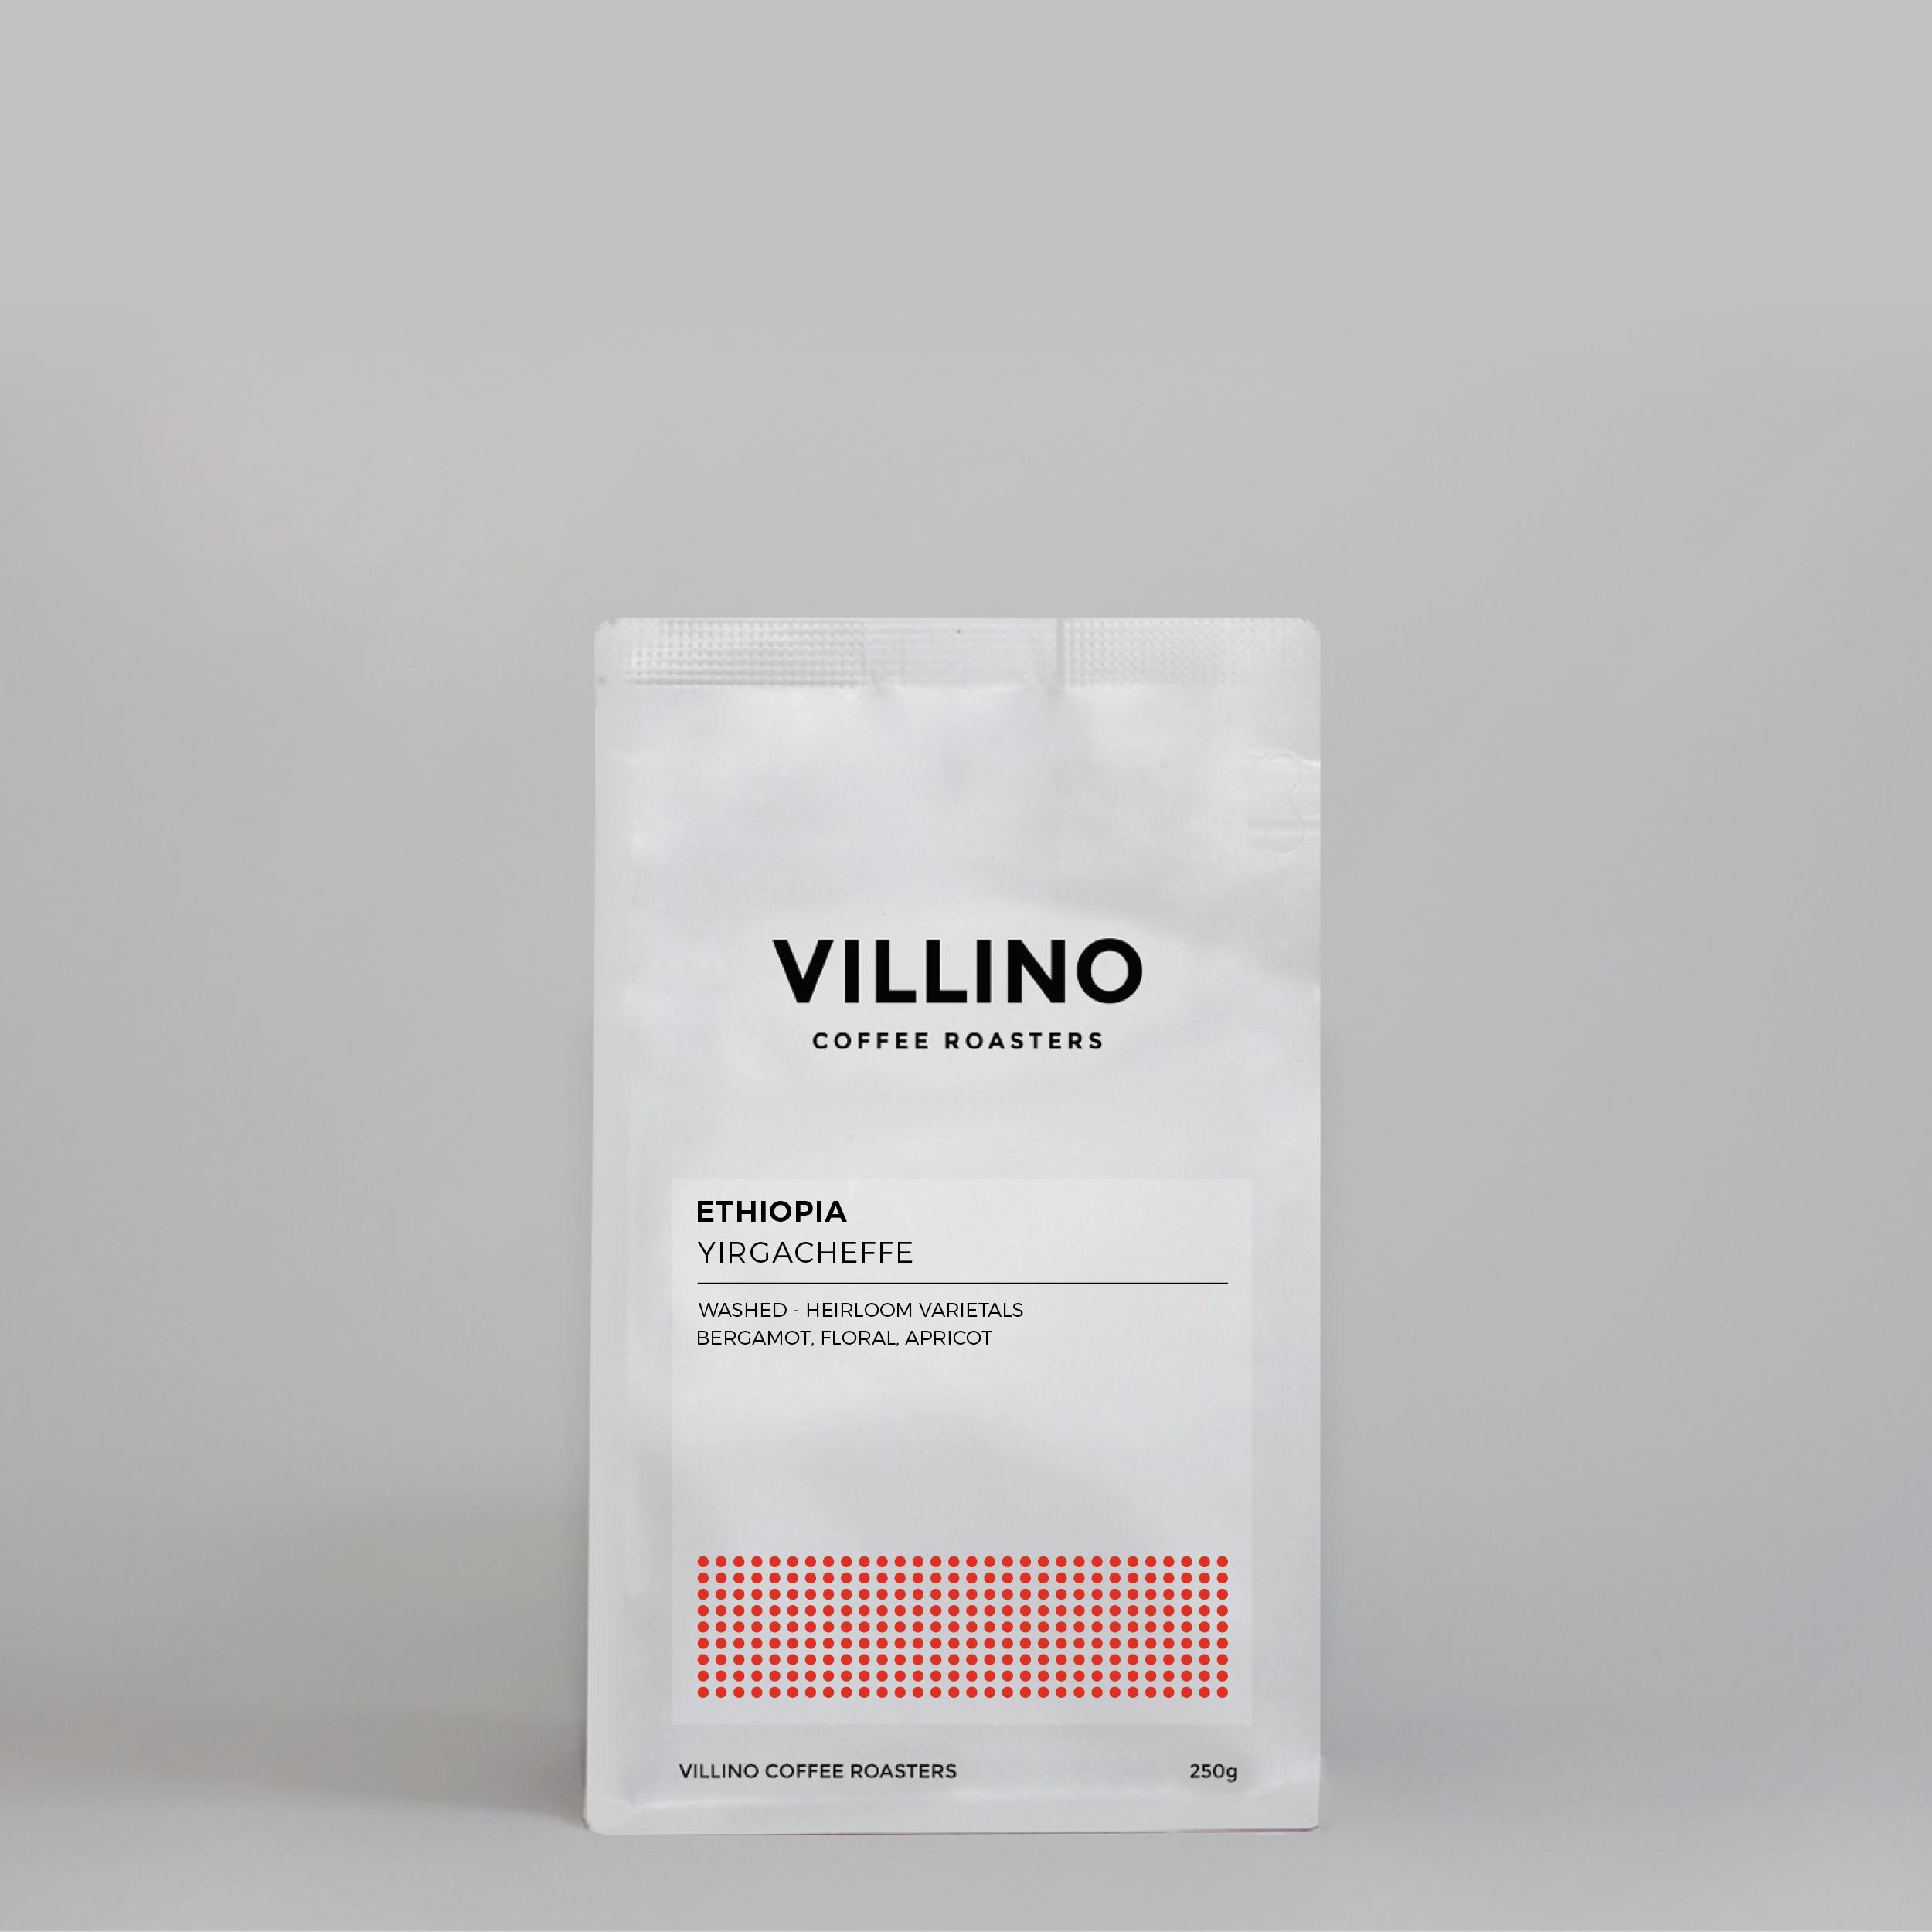 Villino_Retail Bag Yirgacheffe_600x600px16.png